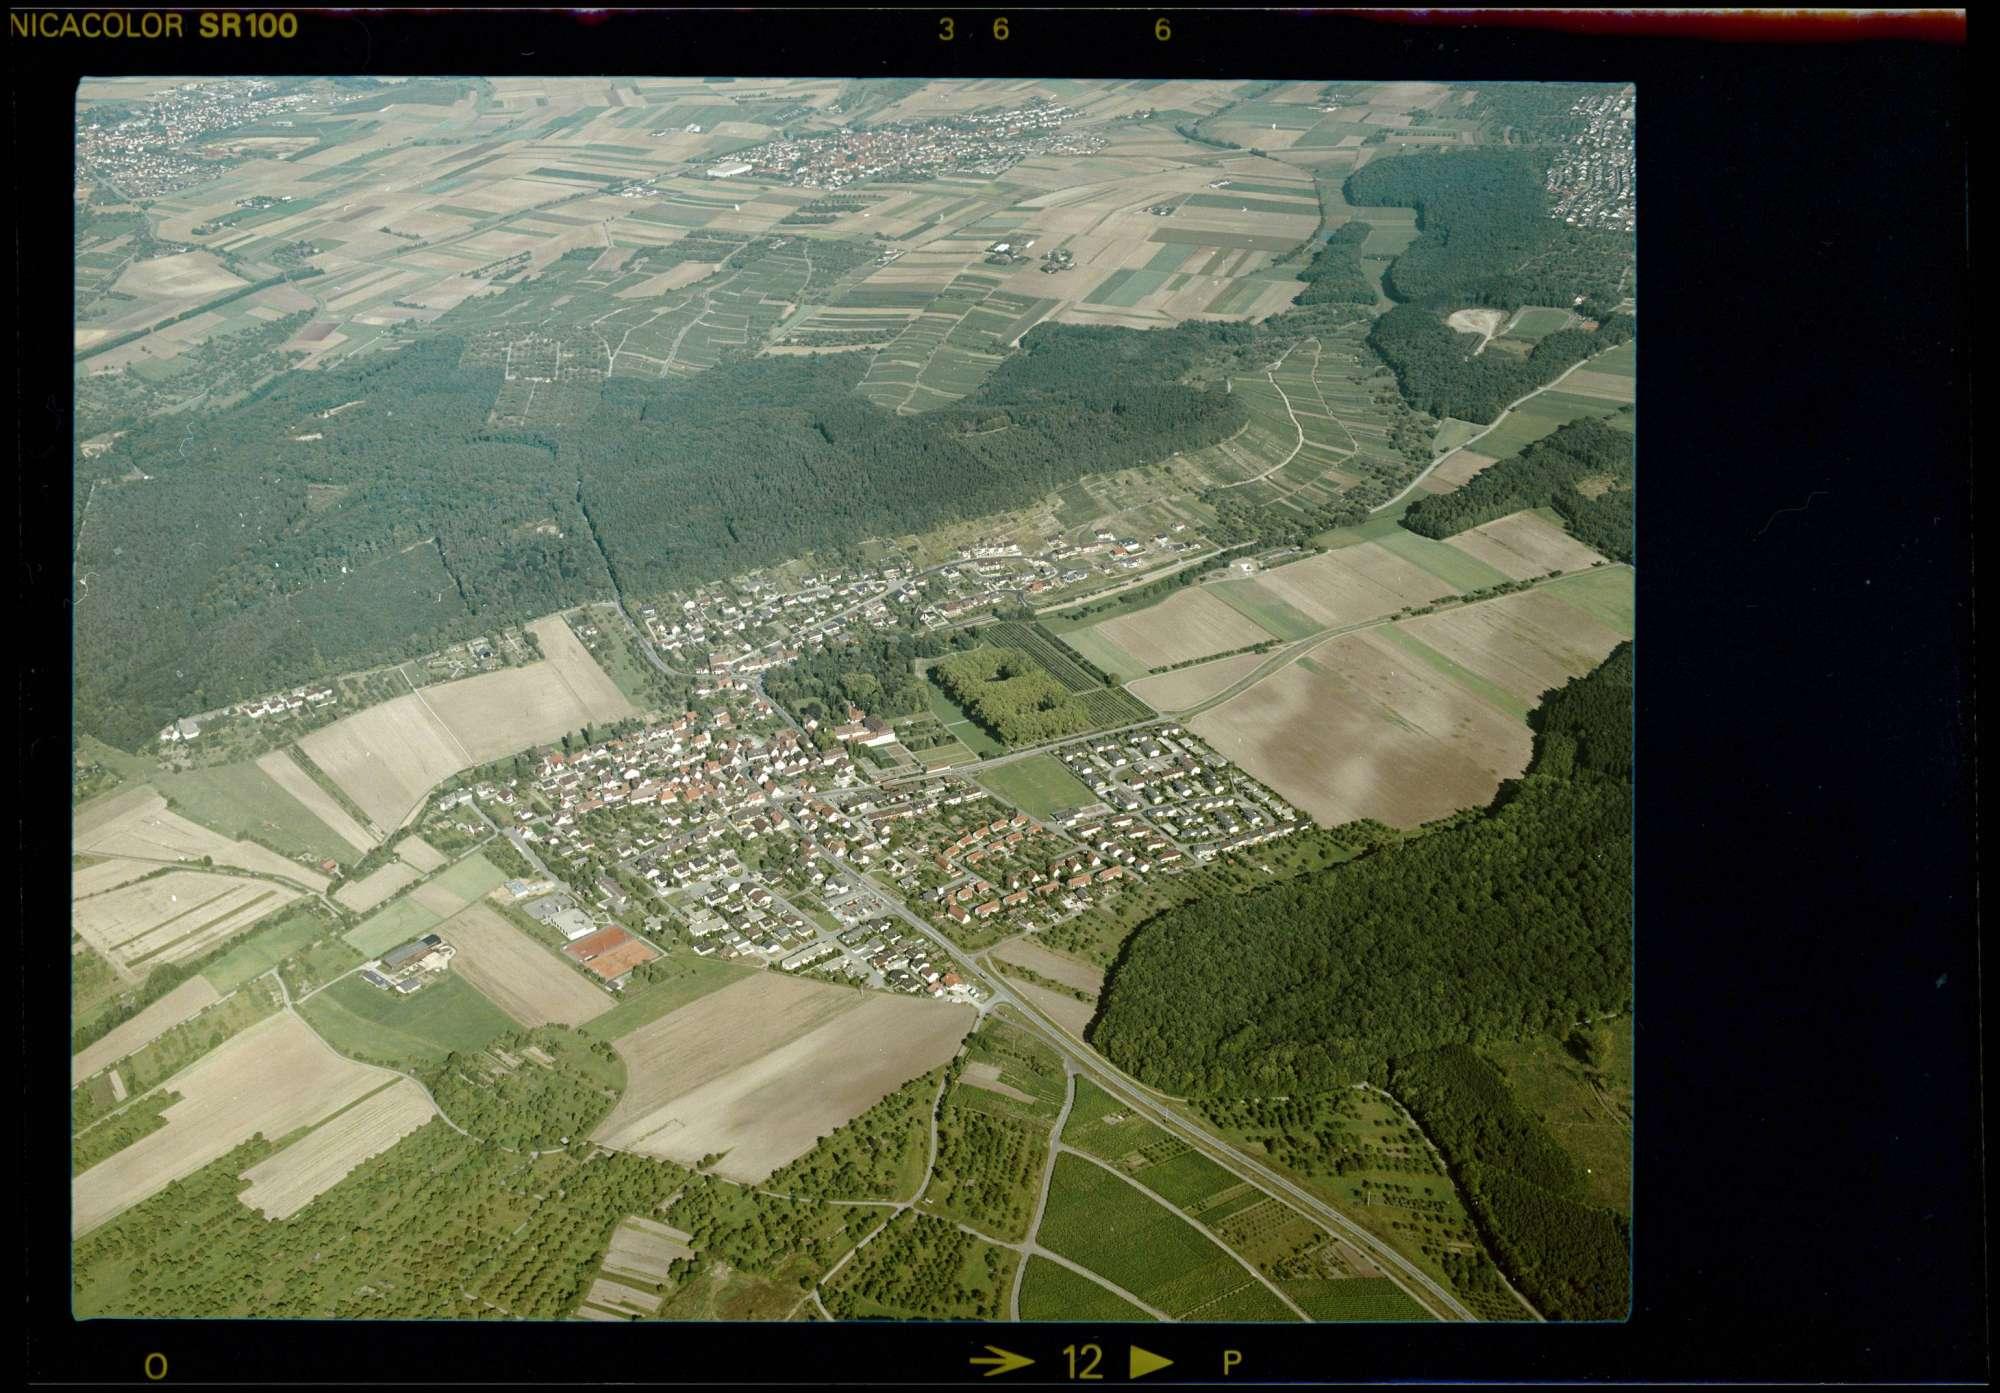 Freudental, Luftbild, Bild 1